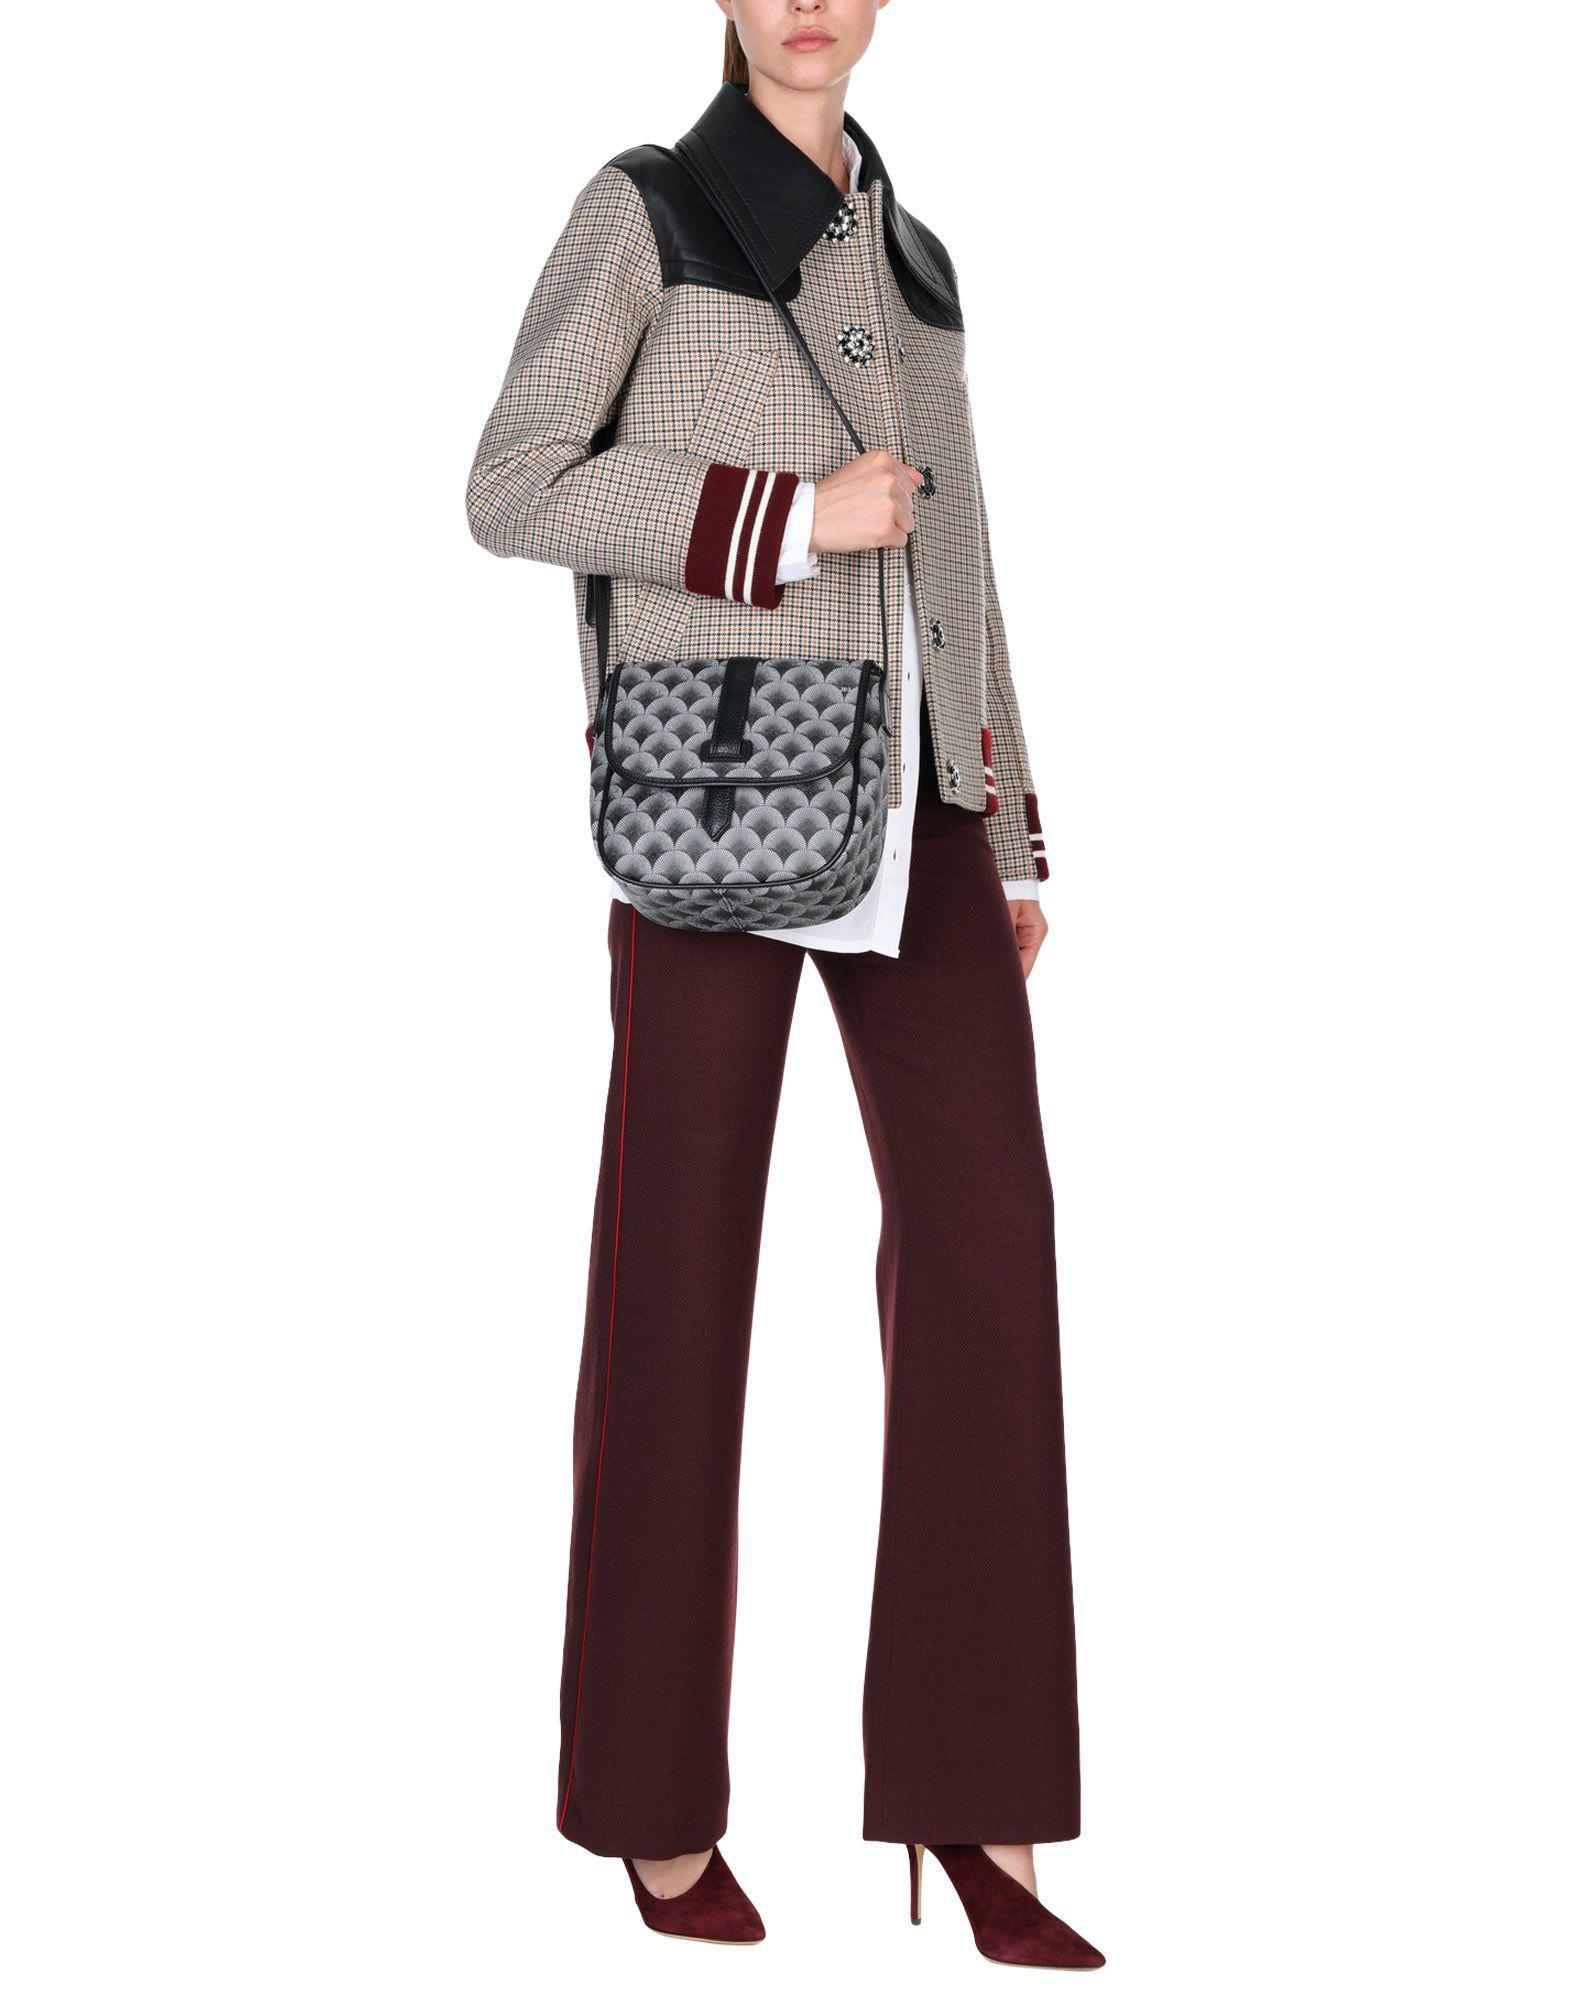 289 by SARA GIUNTI Leather Cross-body Bag in Lead (Grey)